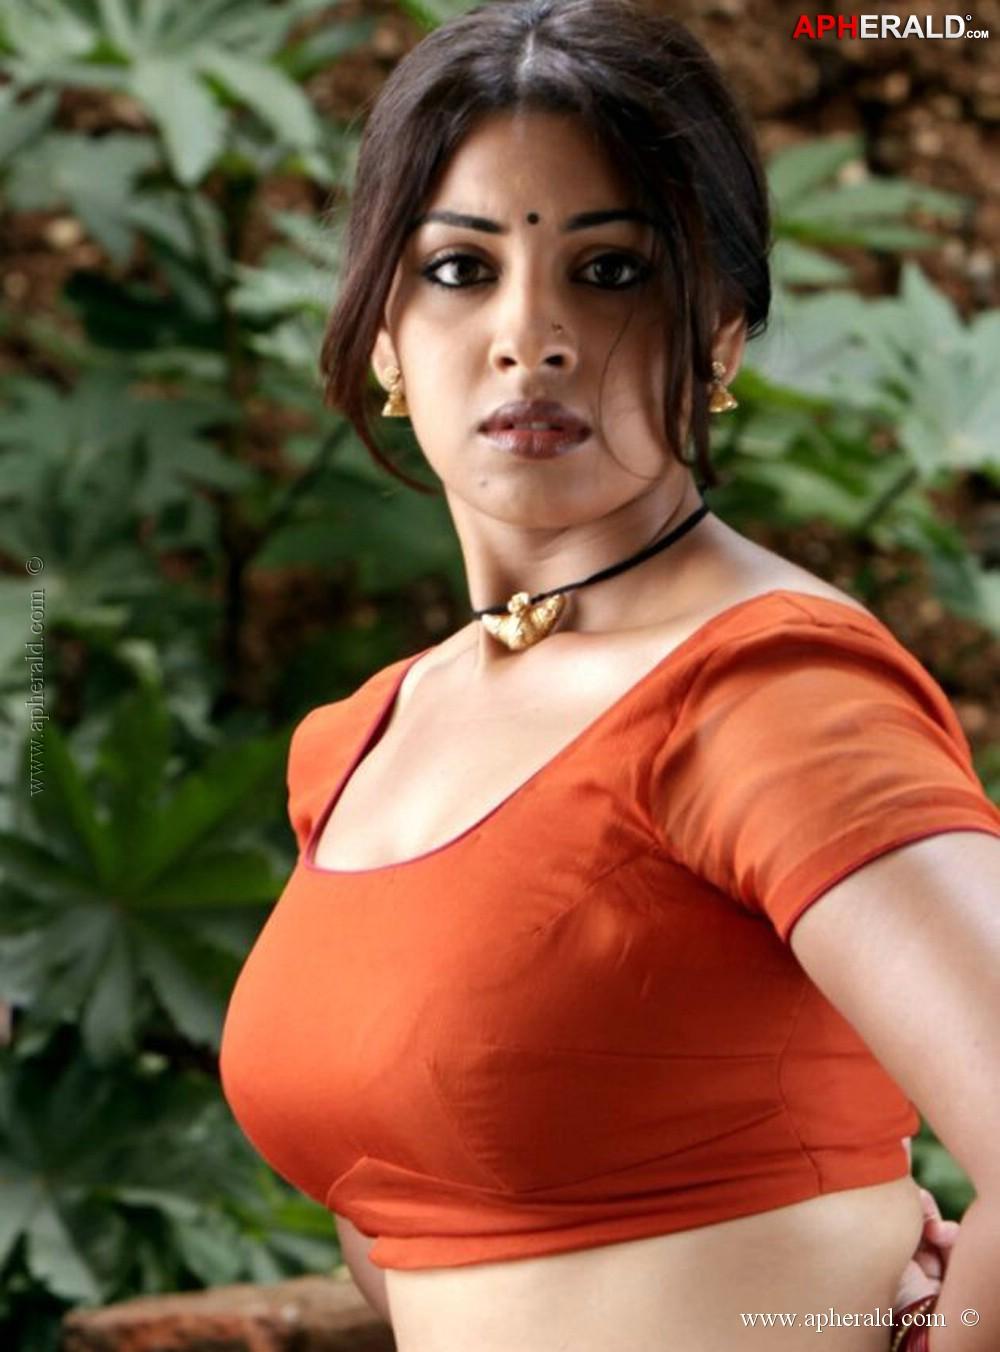 Richa Gangopadhyay naked (24 photo), Tits, Fappening, Selfie, butt 2006